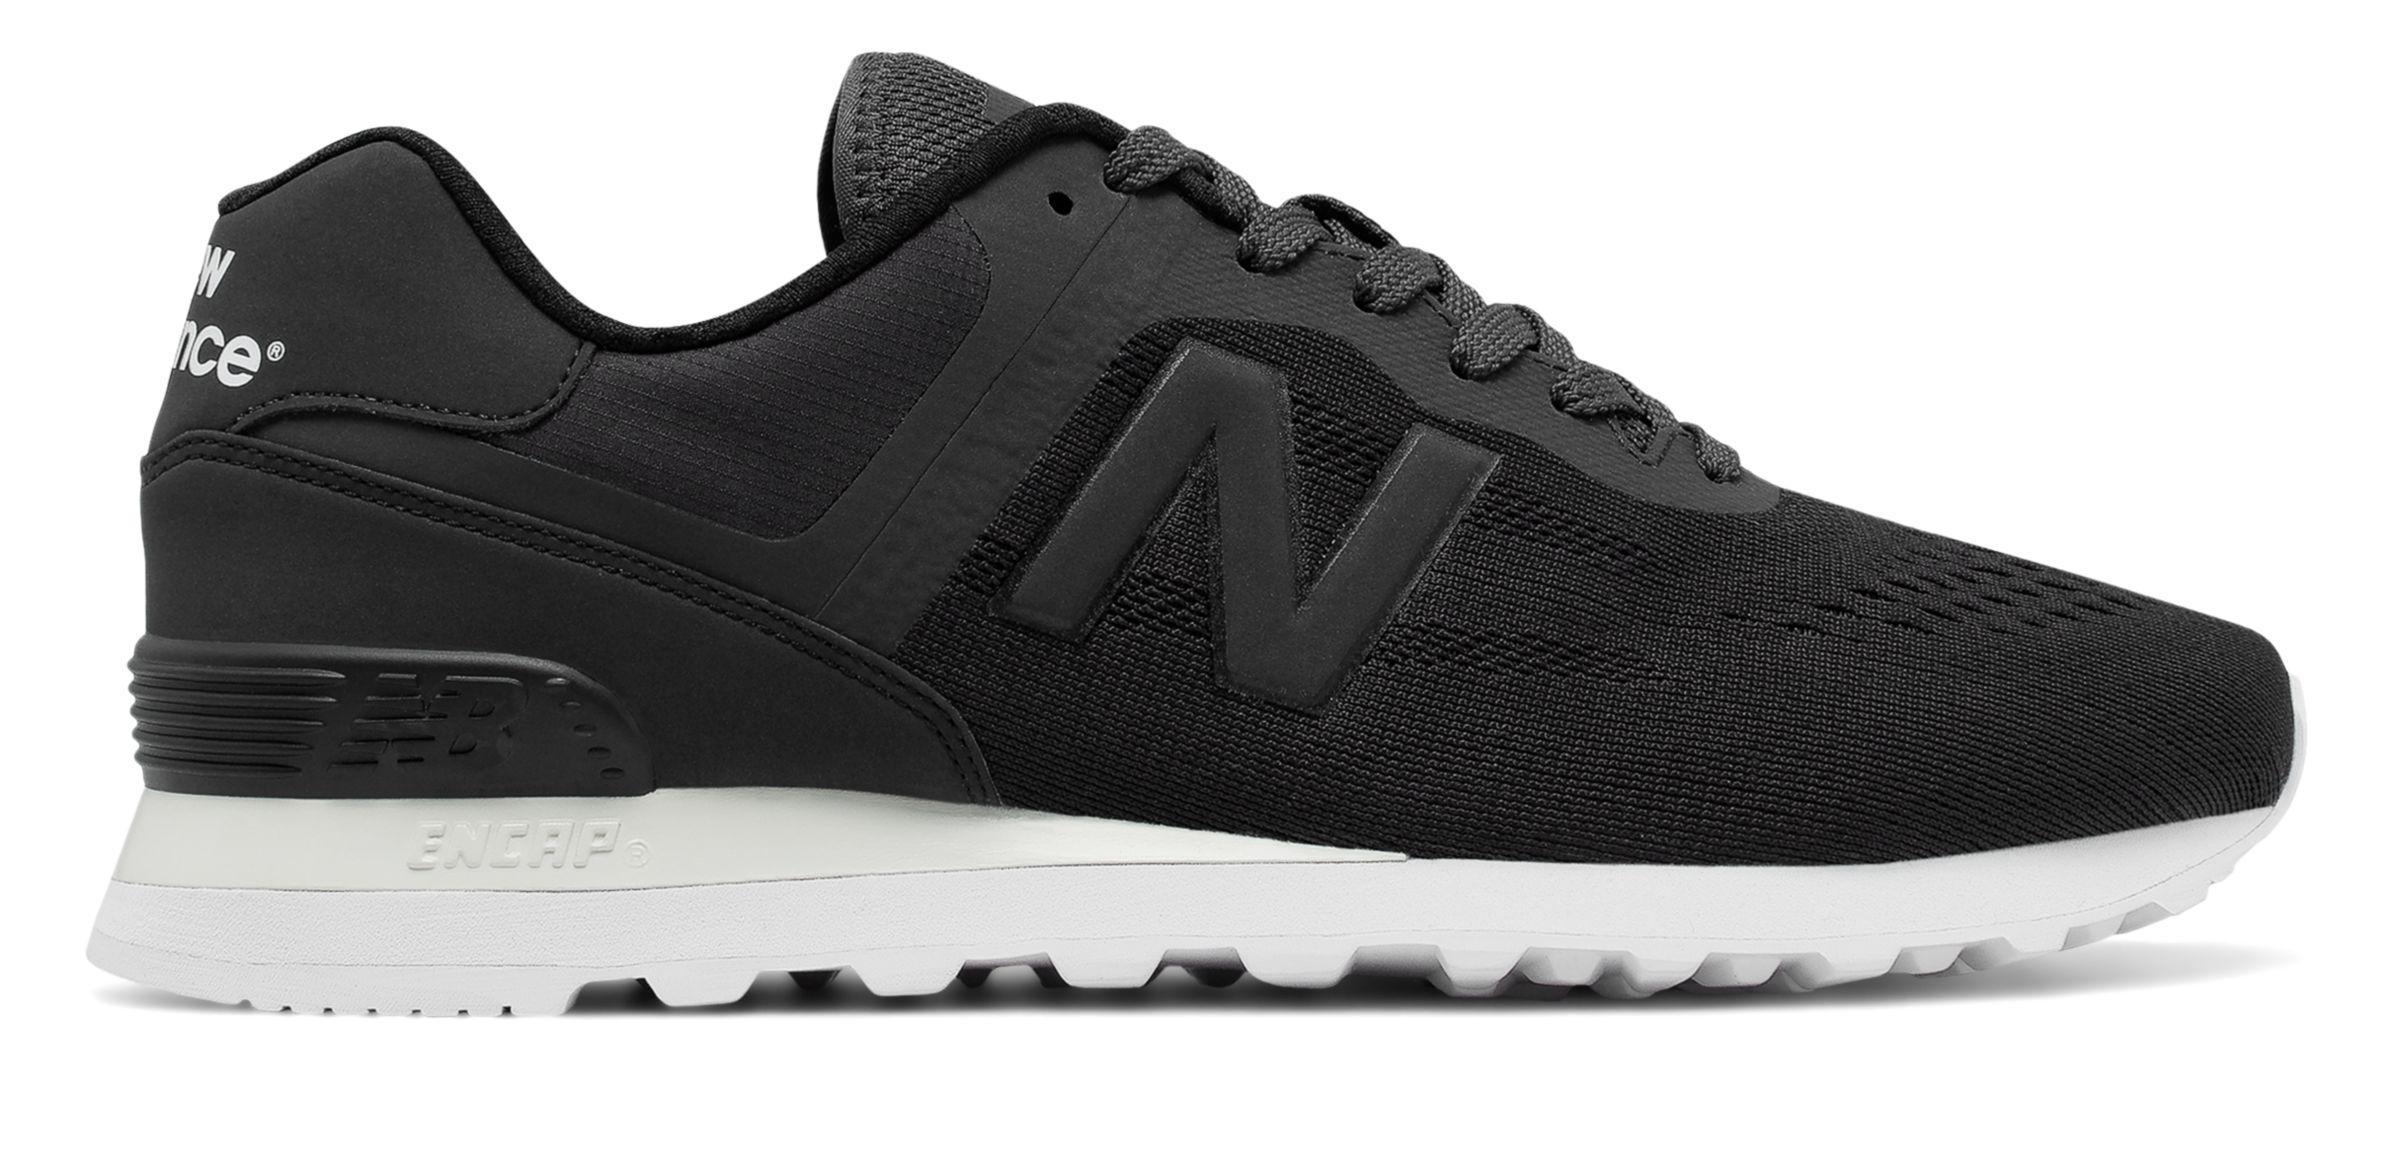 New Balance 574 Re-Engineered Black/Charcoal